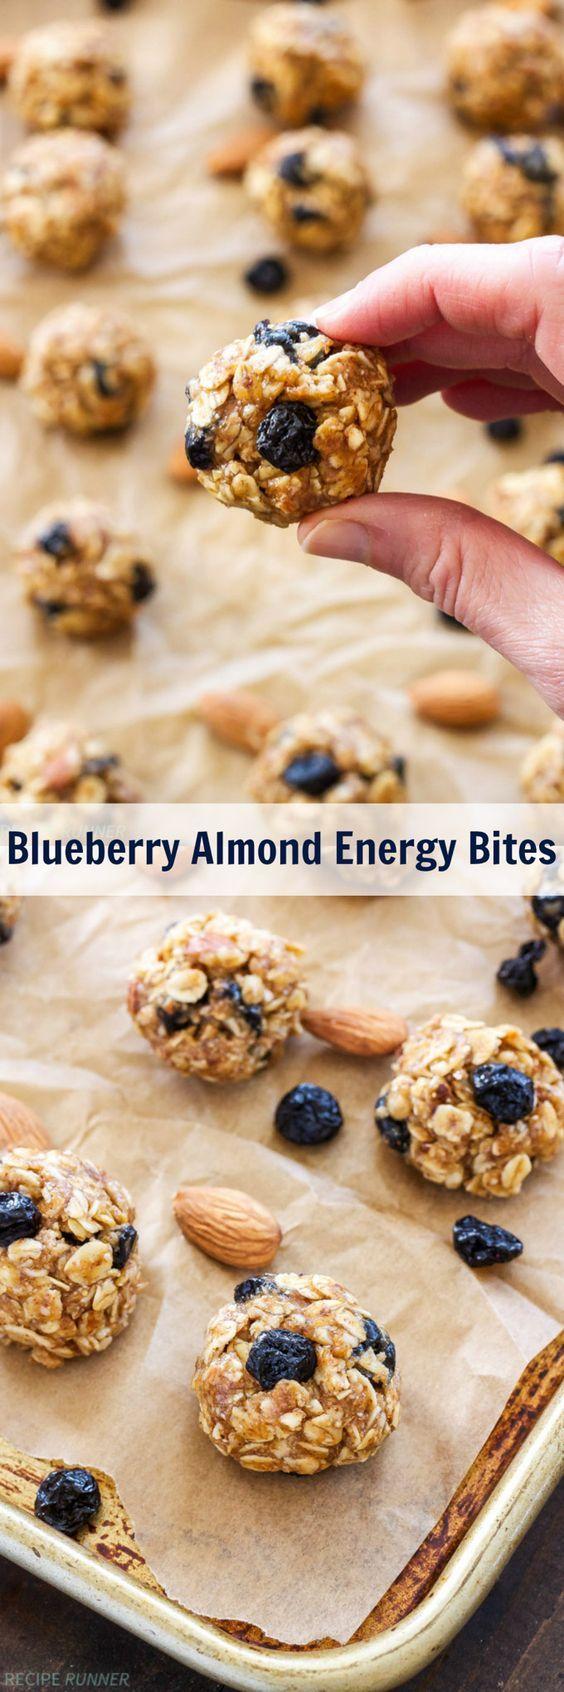 Gluten-Free Blueberry Almond Energy Bites Recipe